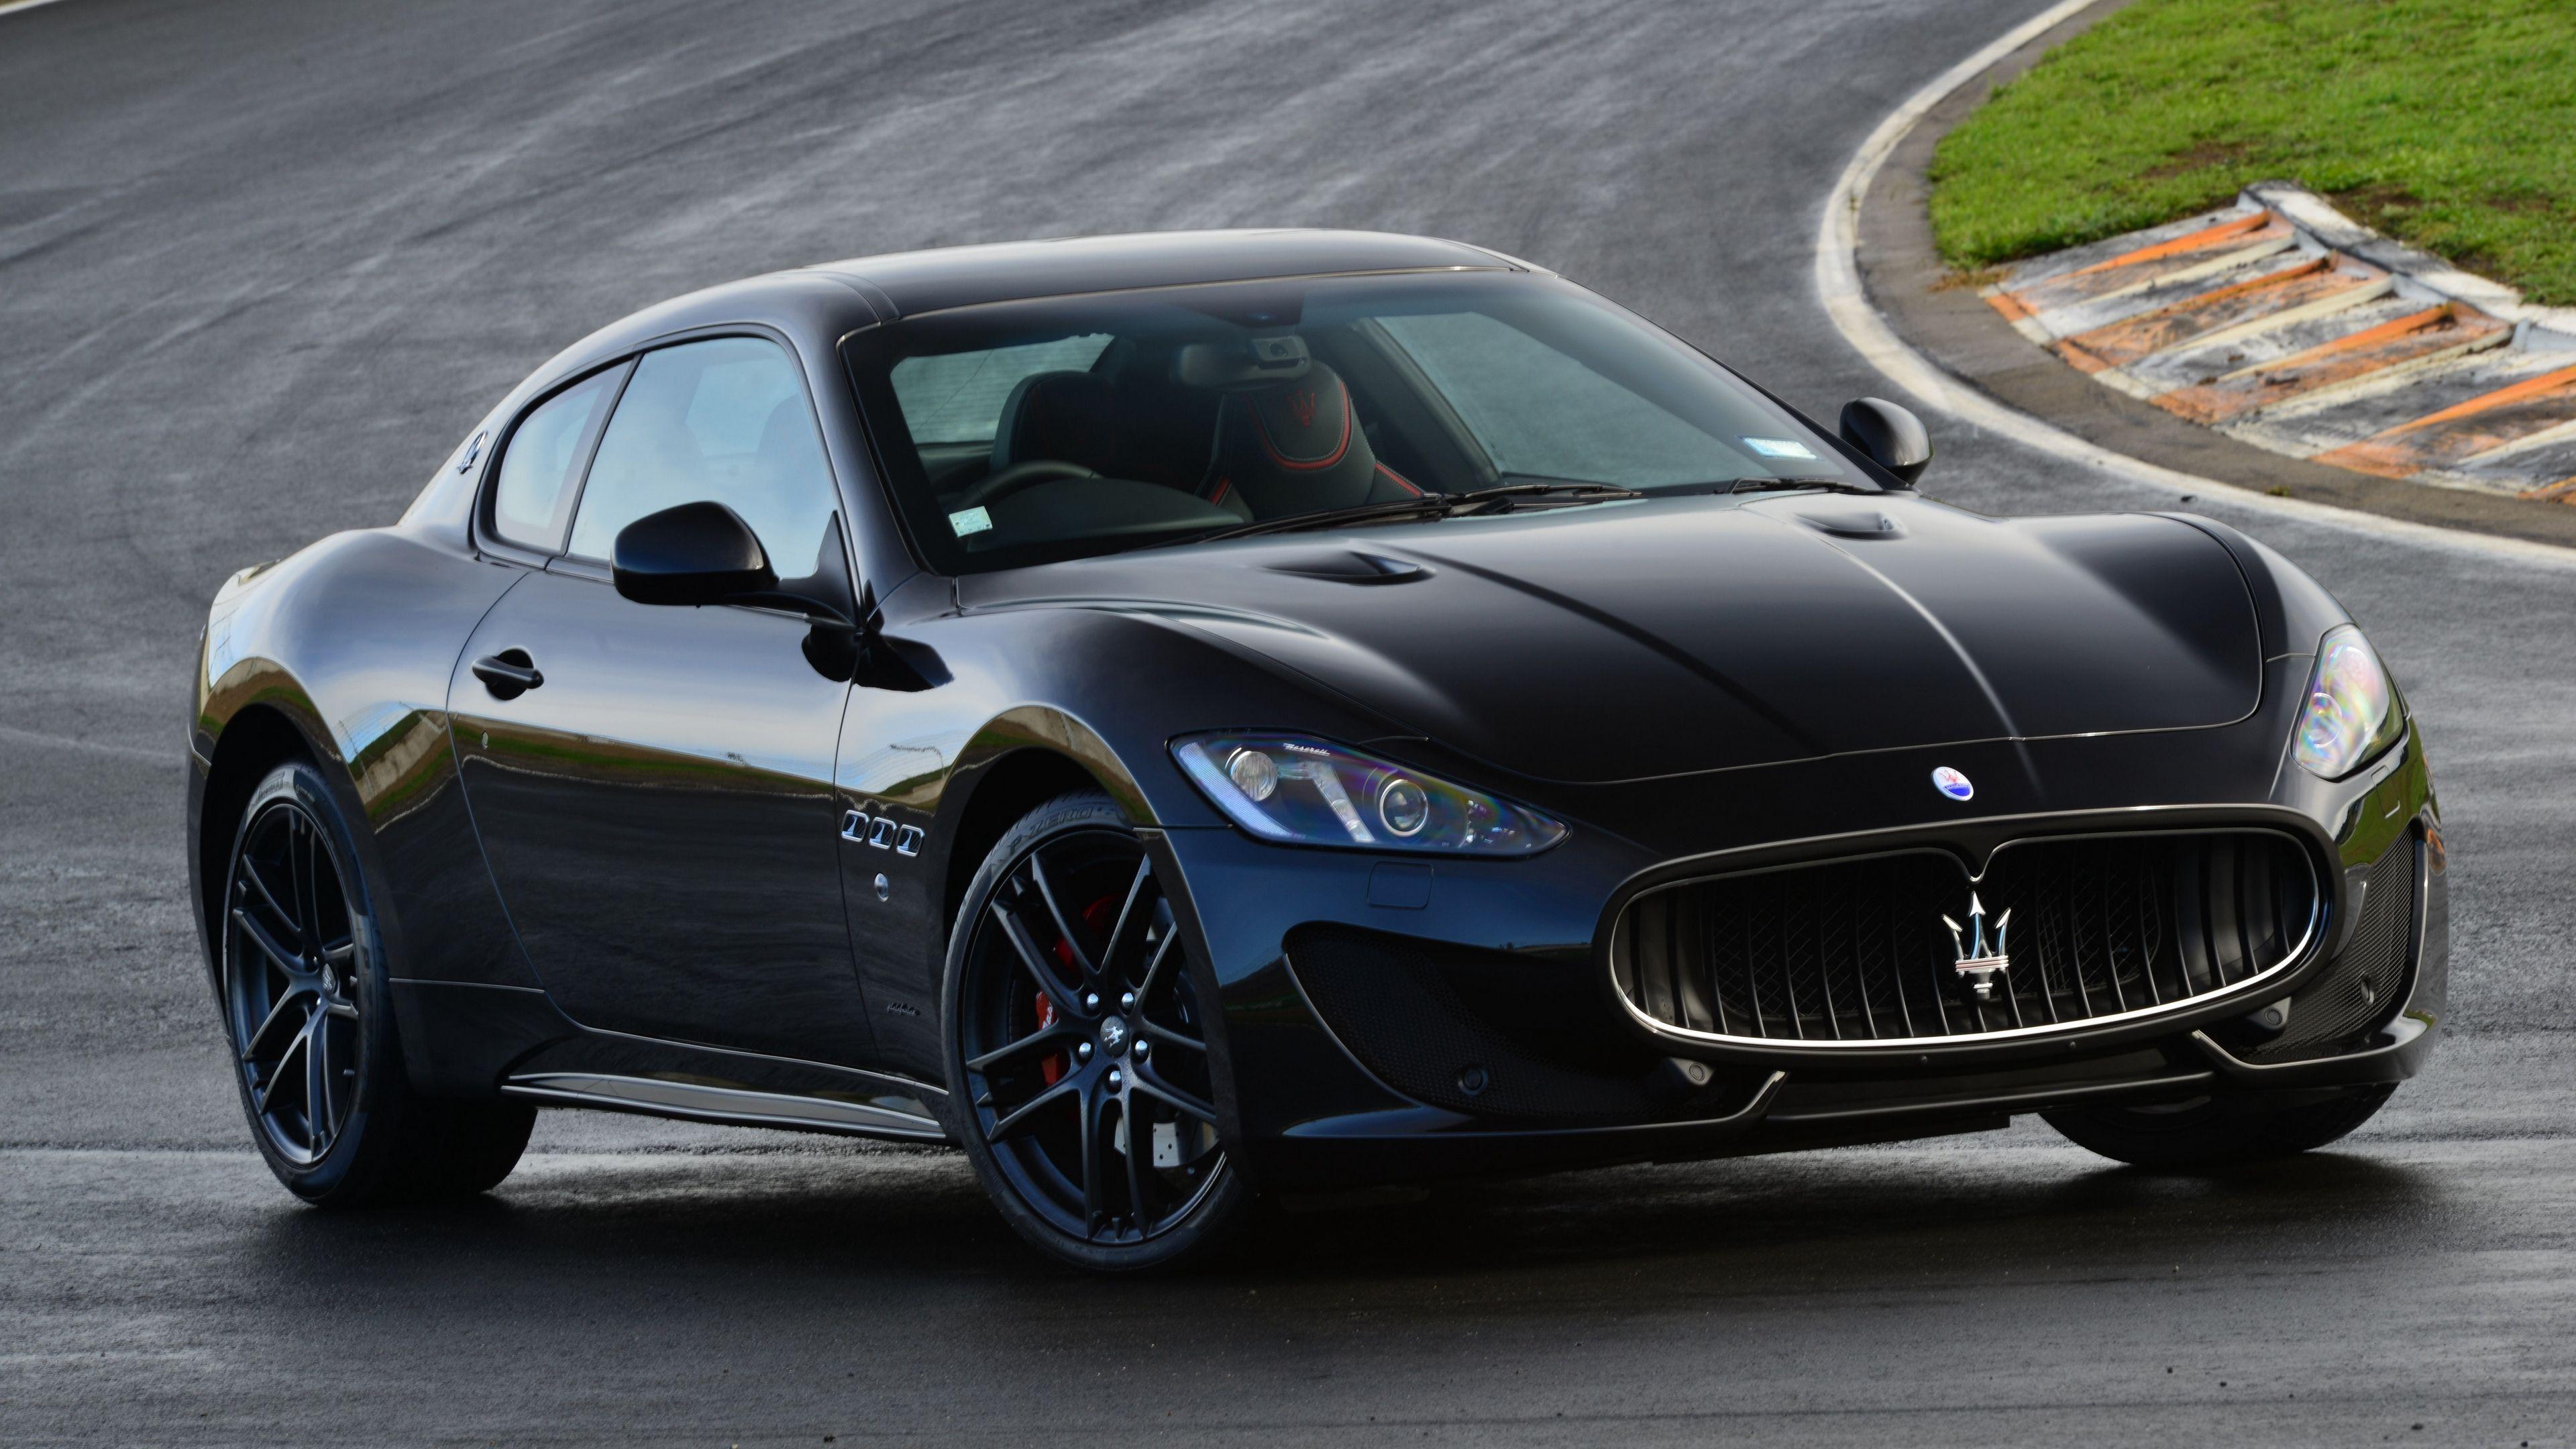 Maserati Granturismo Mc Sportline Side View Black 4k Mc Sportline Maserati Granturismo Maserati Granturismo Maserati Super Luxury Cars